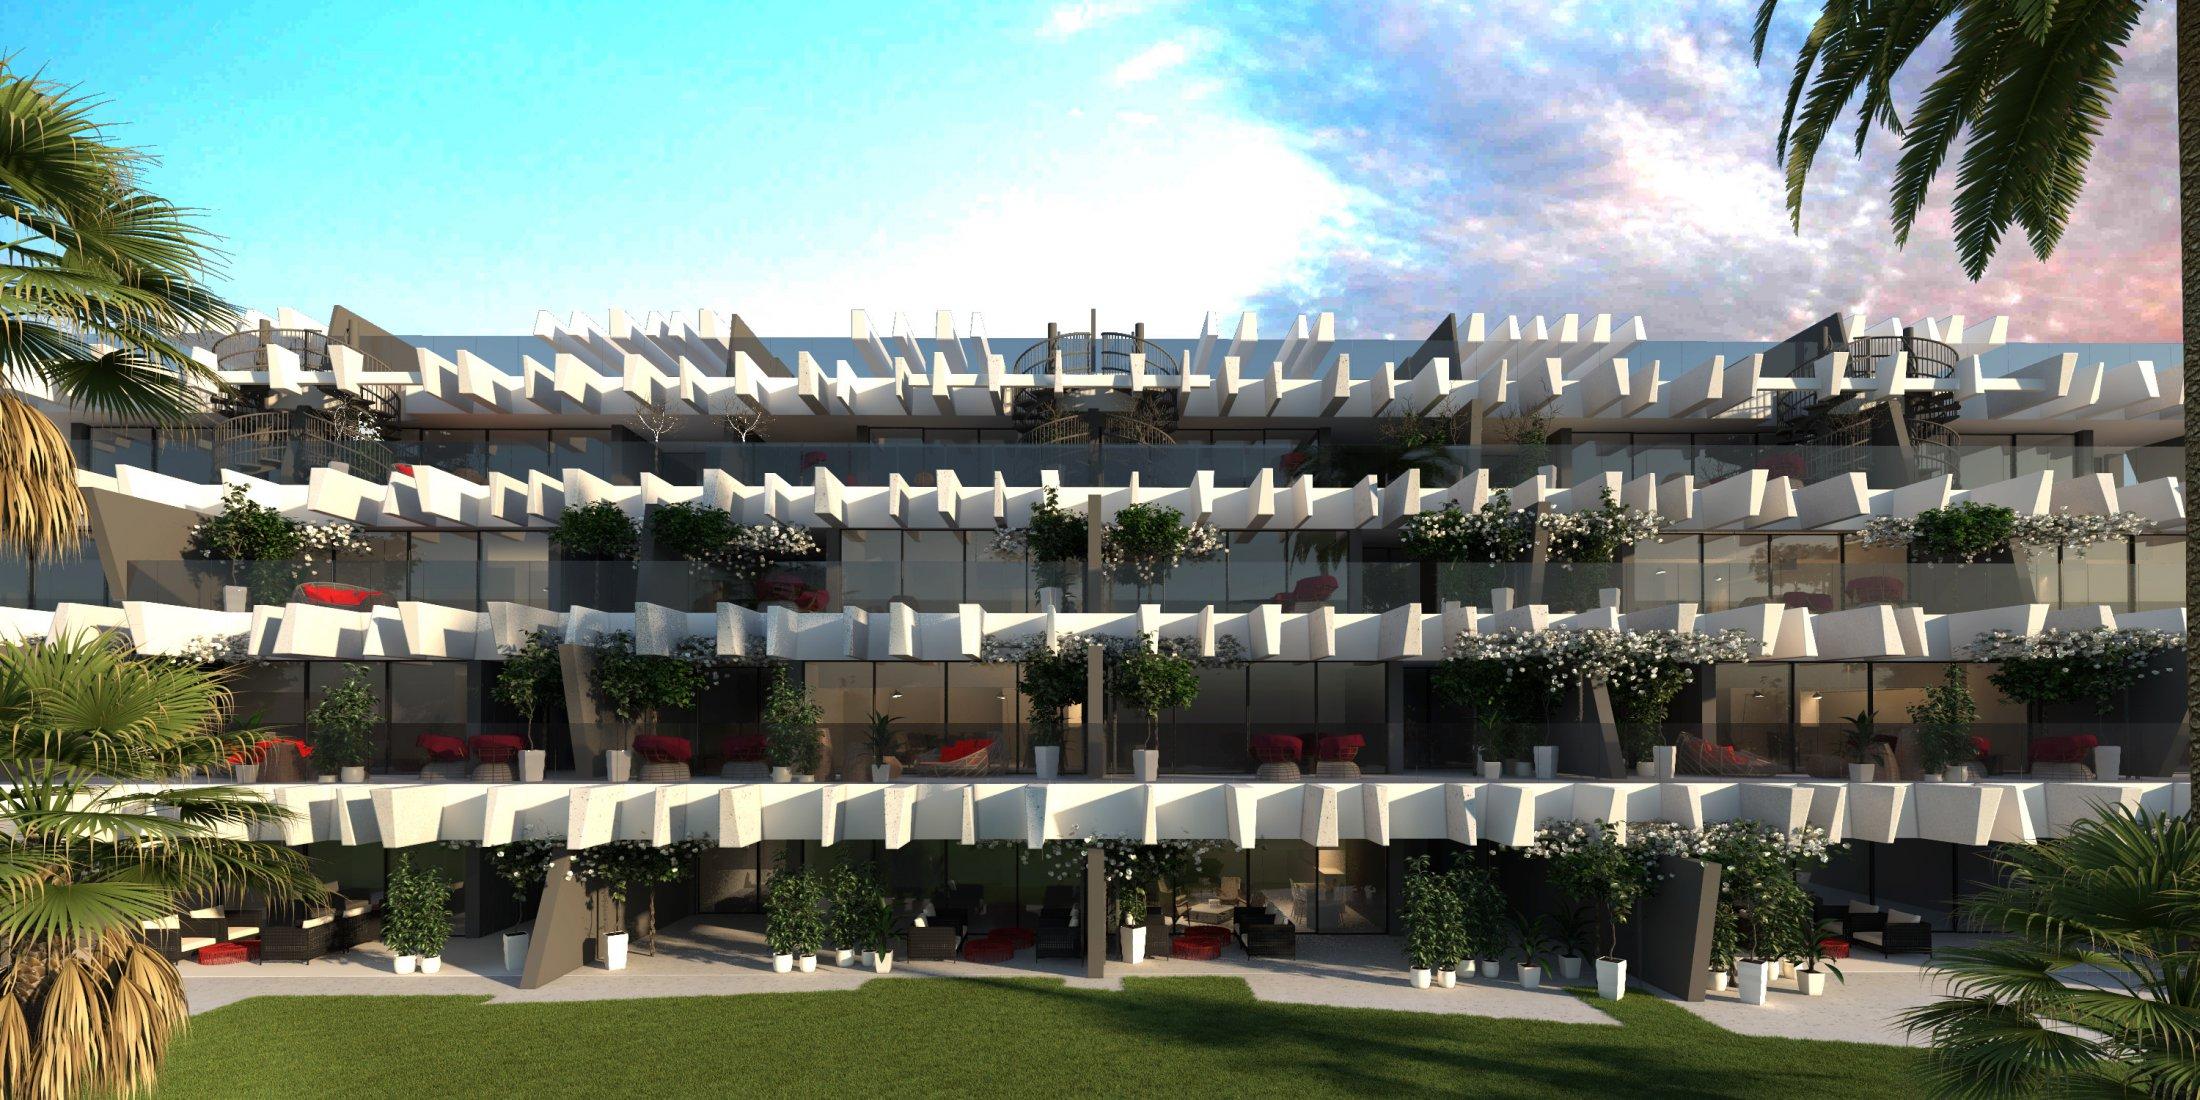 Jouw privé oase- Marbella